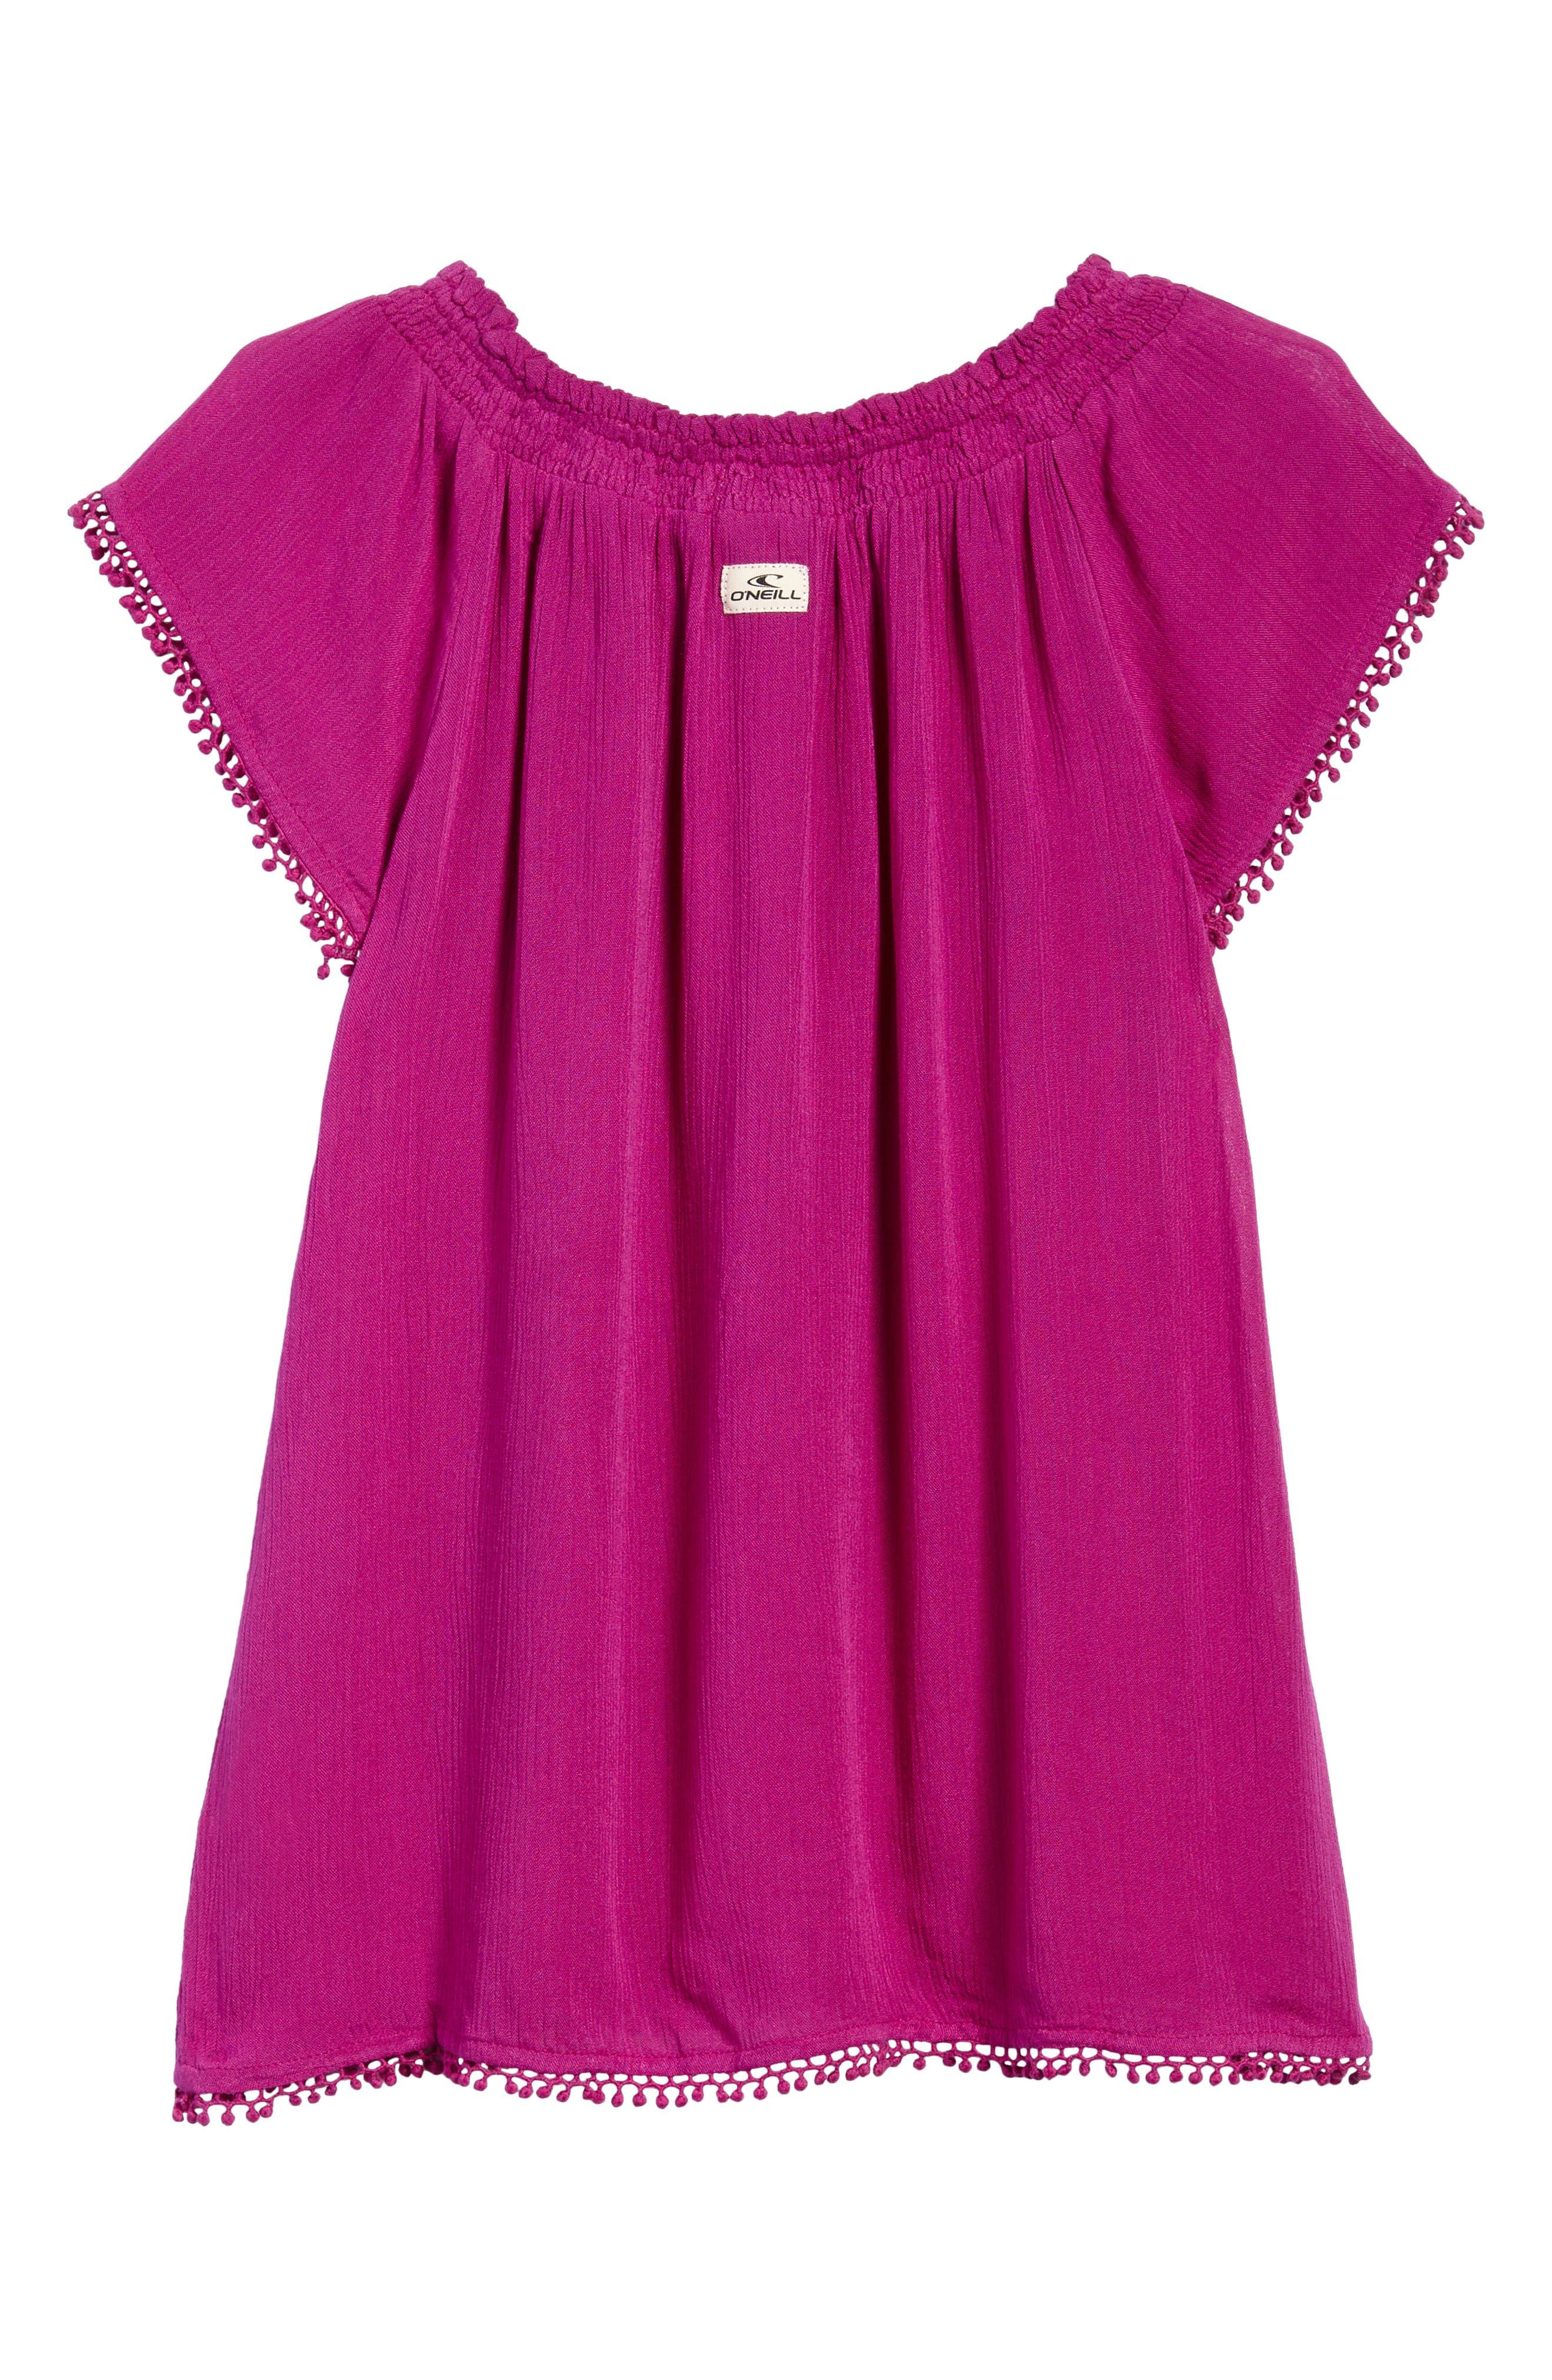 Avery Woven Dress,                             Alternate thumbnail 2, color,